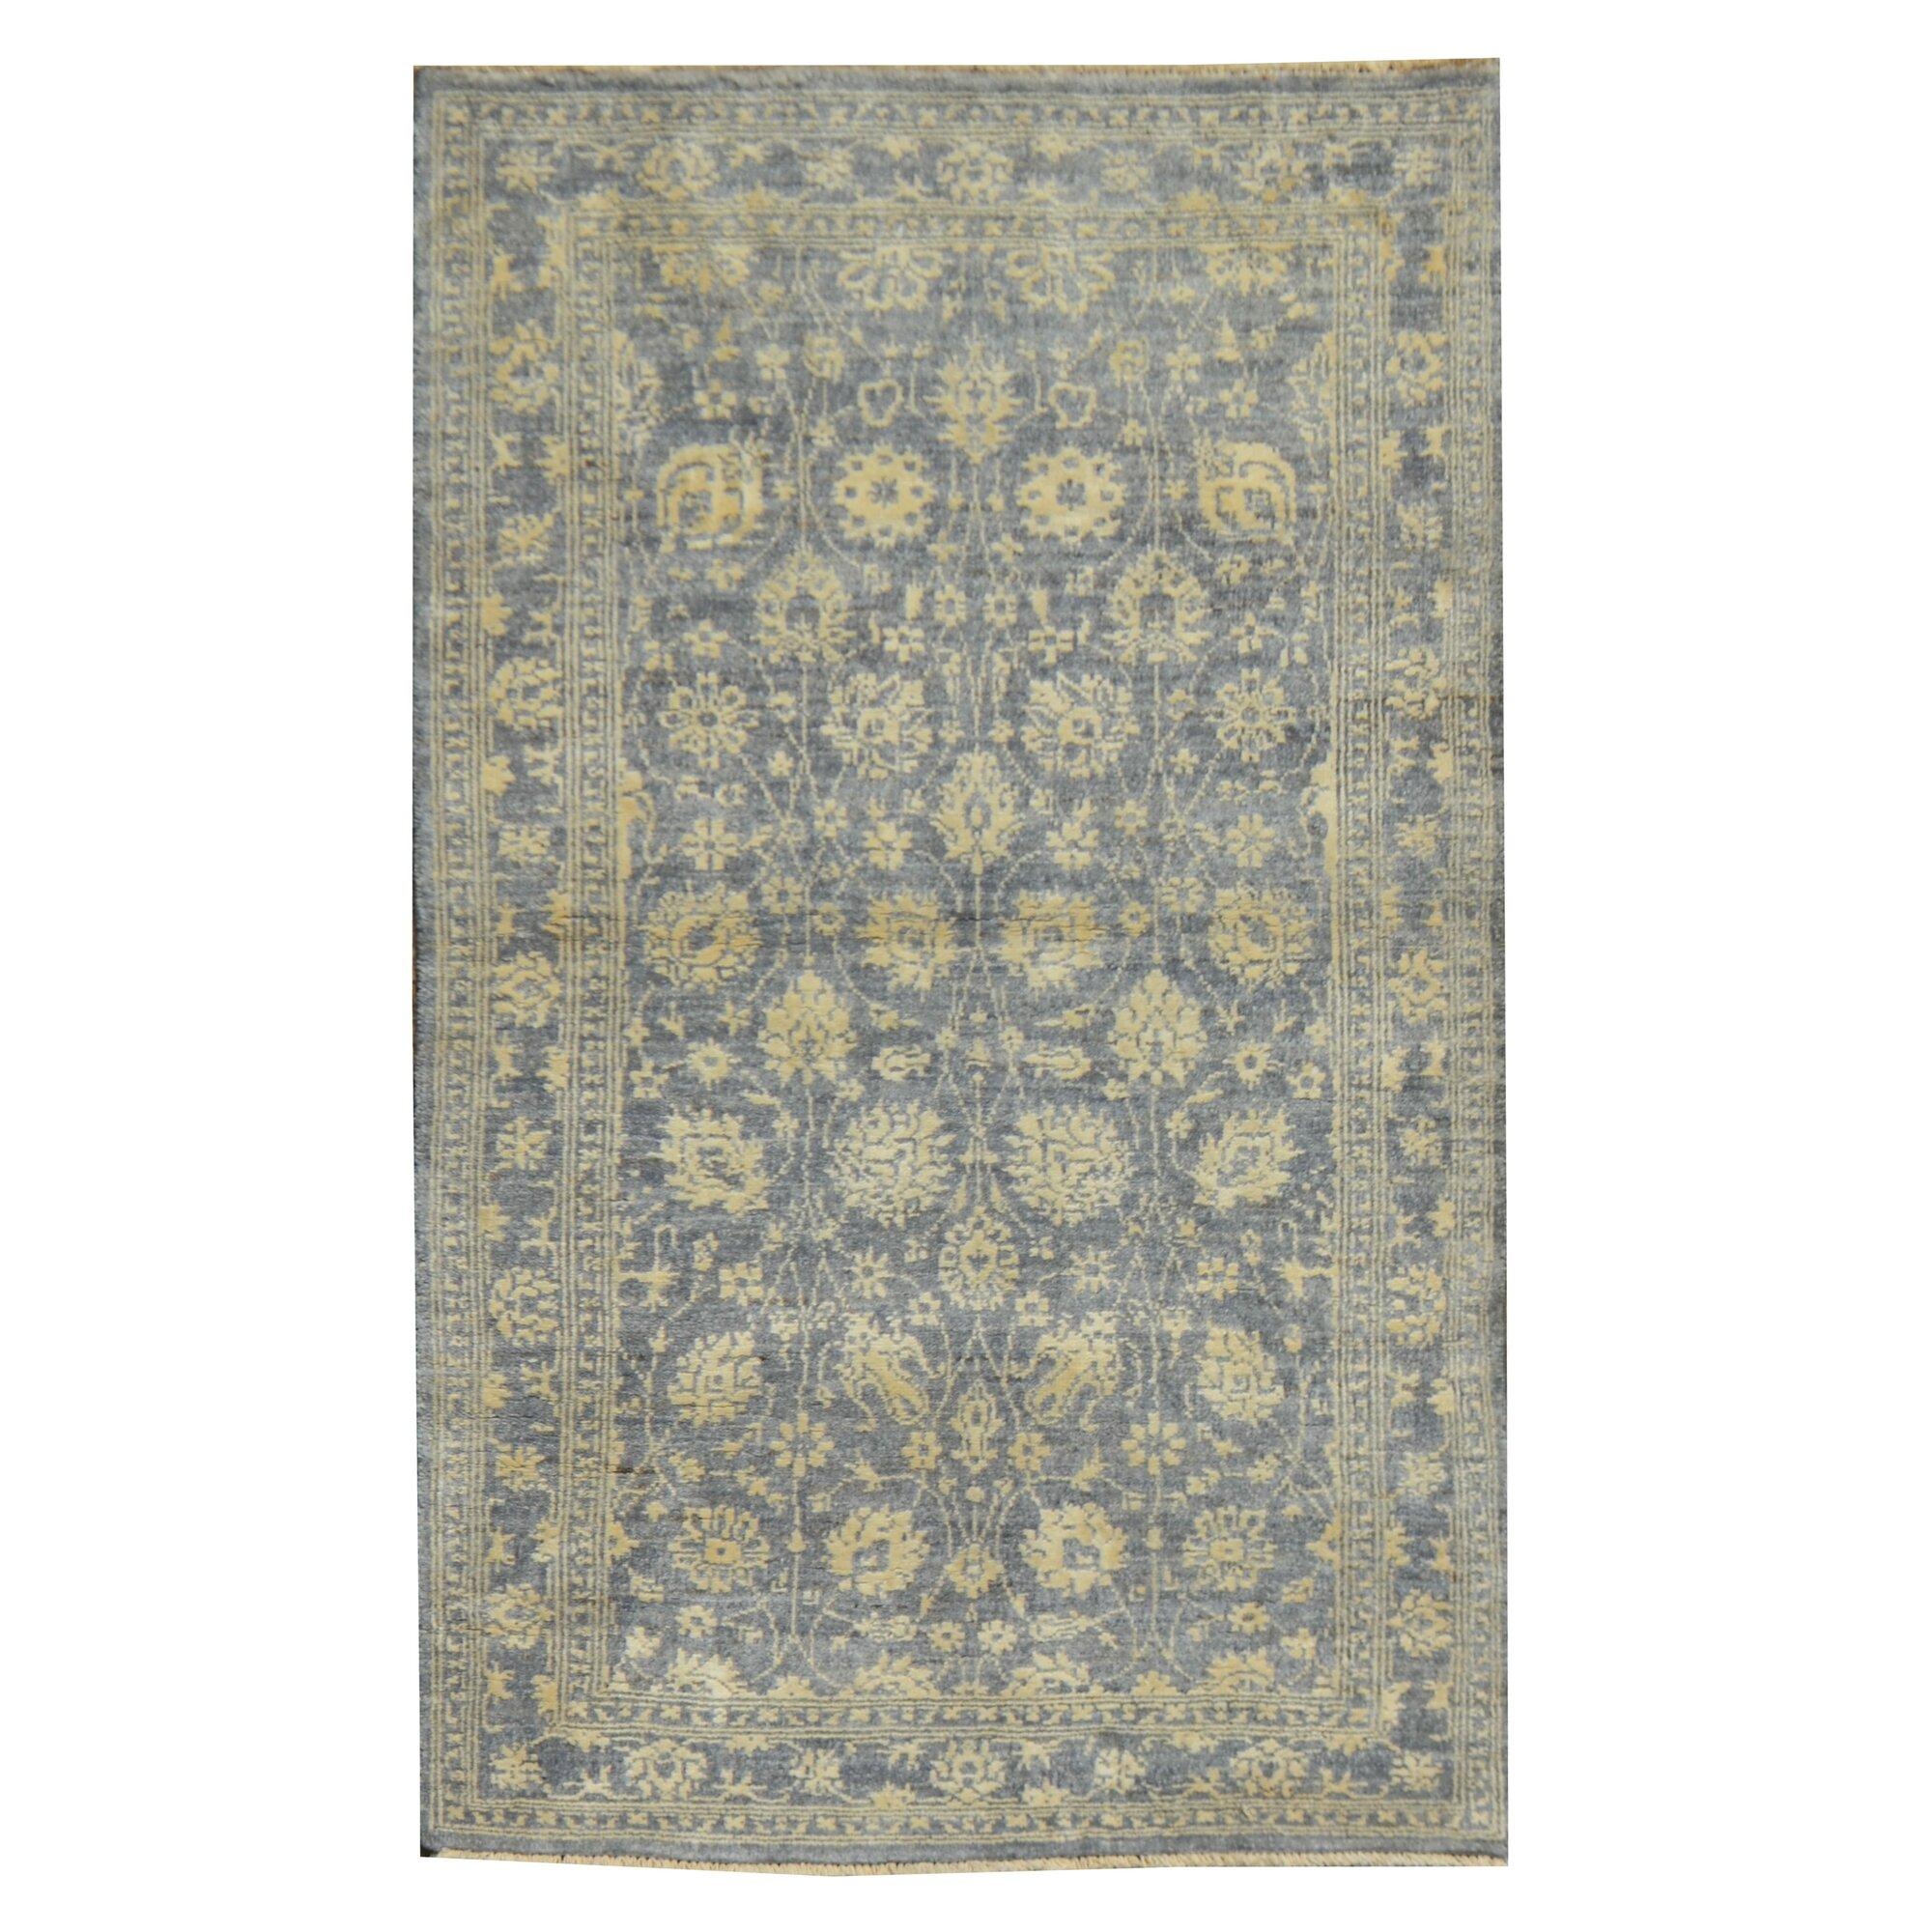 caracella handgewebter teppich silk ziegler in grau gelb. Black Bedroom Furniture Sets. Home Design Ideas